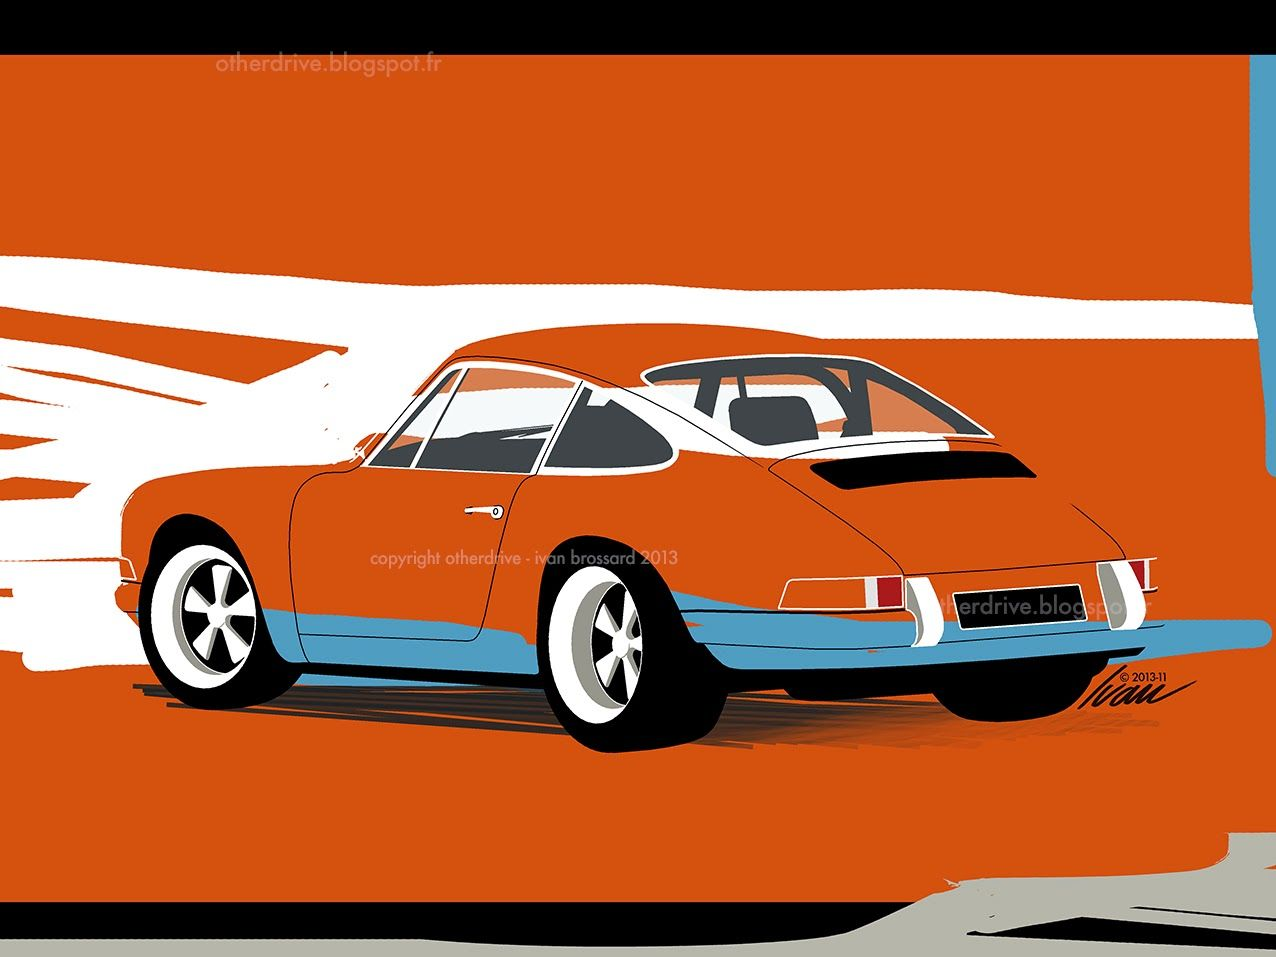 Porsche 911 ivan brossard cars illustrations - Dessin de porsche ...